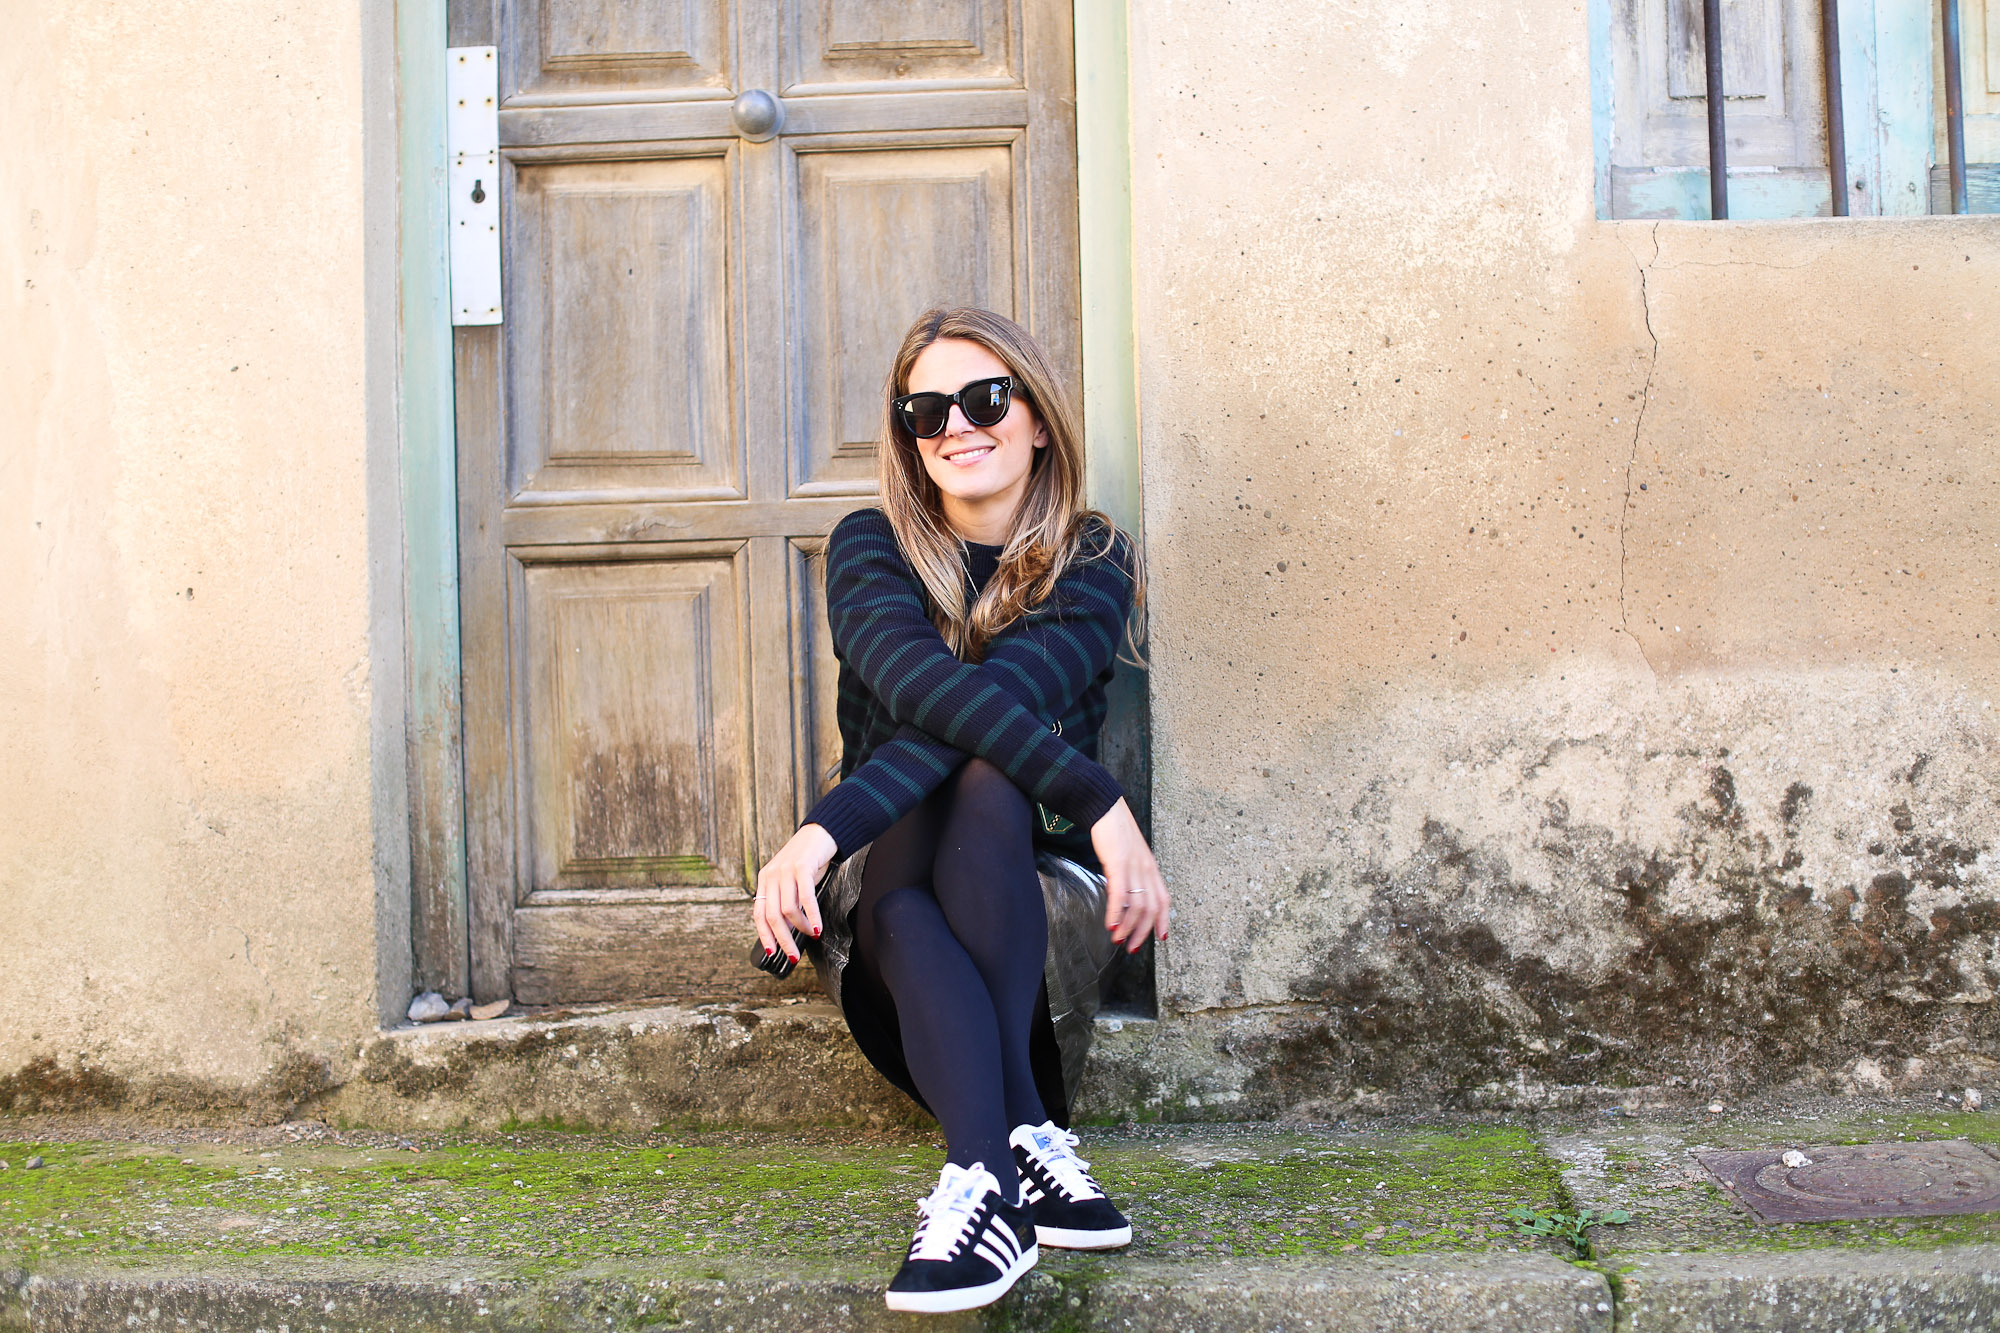 Clochet_streetstyle_fashionblogger_zarametallicleatherskirt_claudiepierlot_stripedknit_adidasgazelle-7